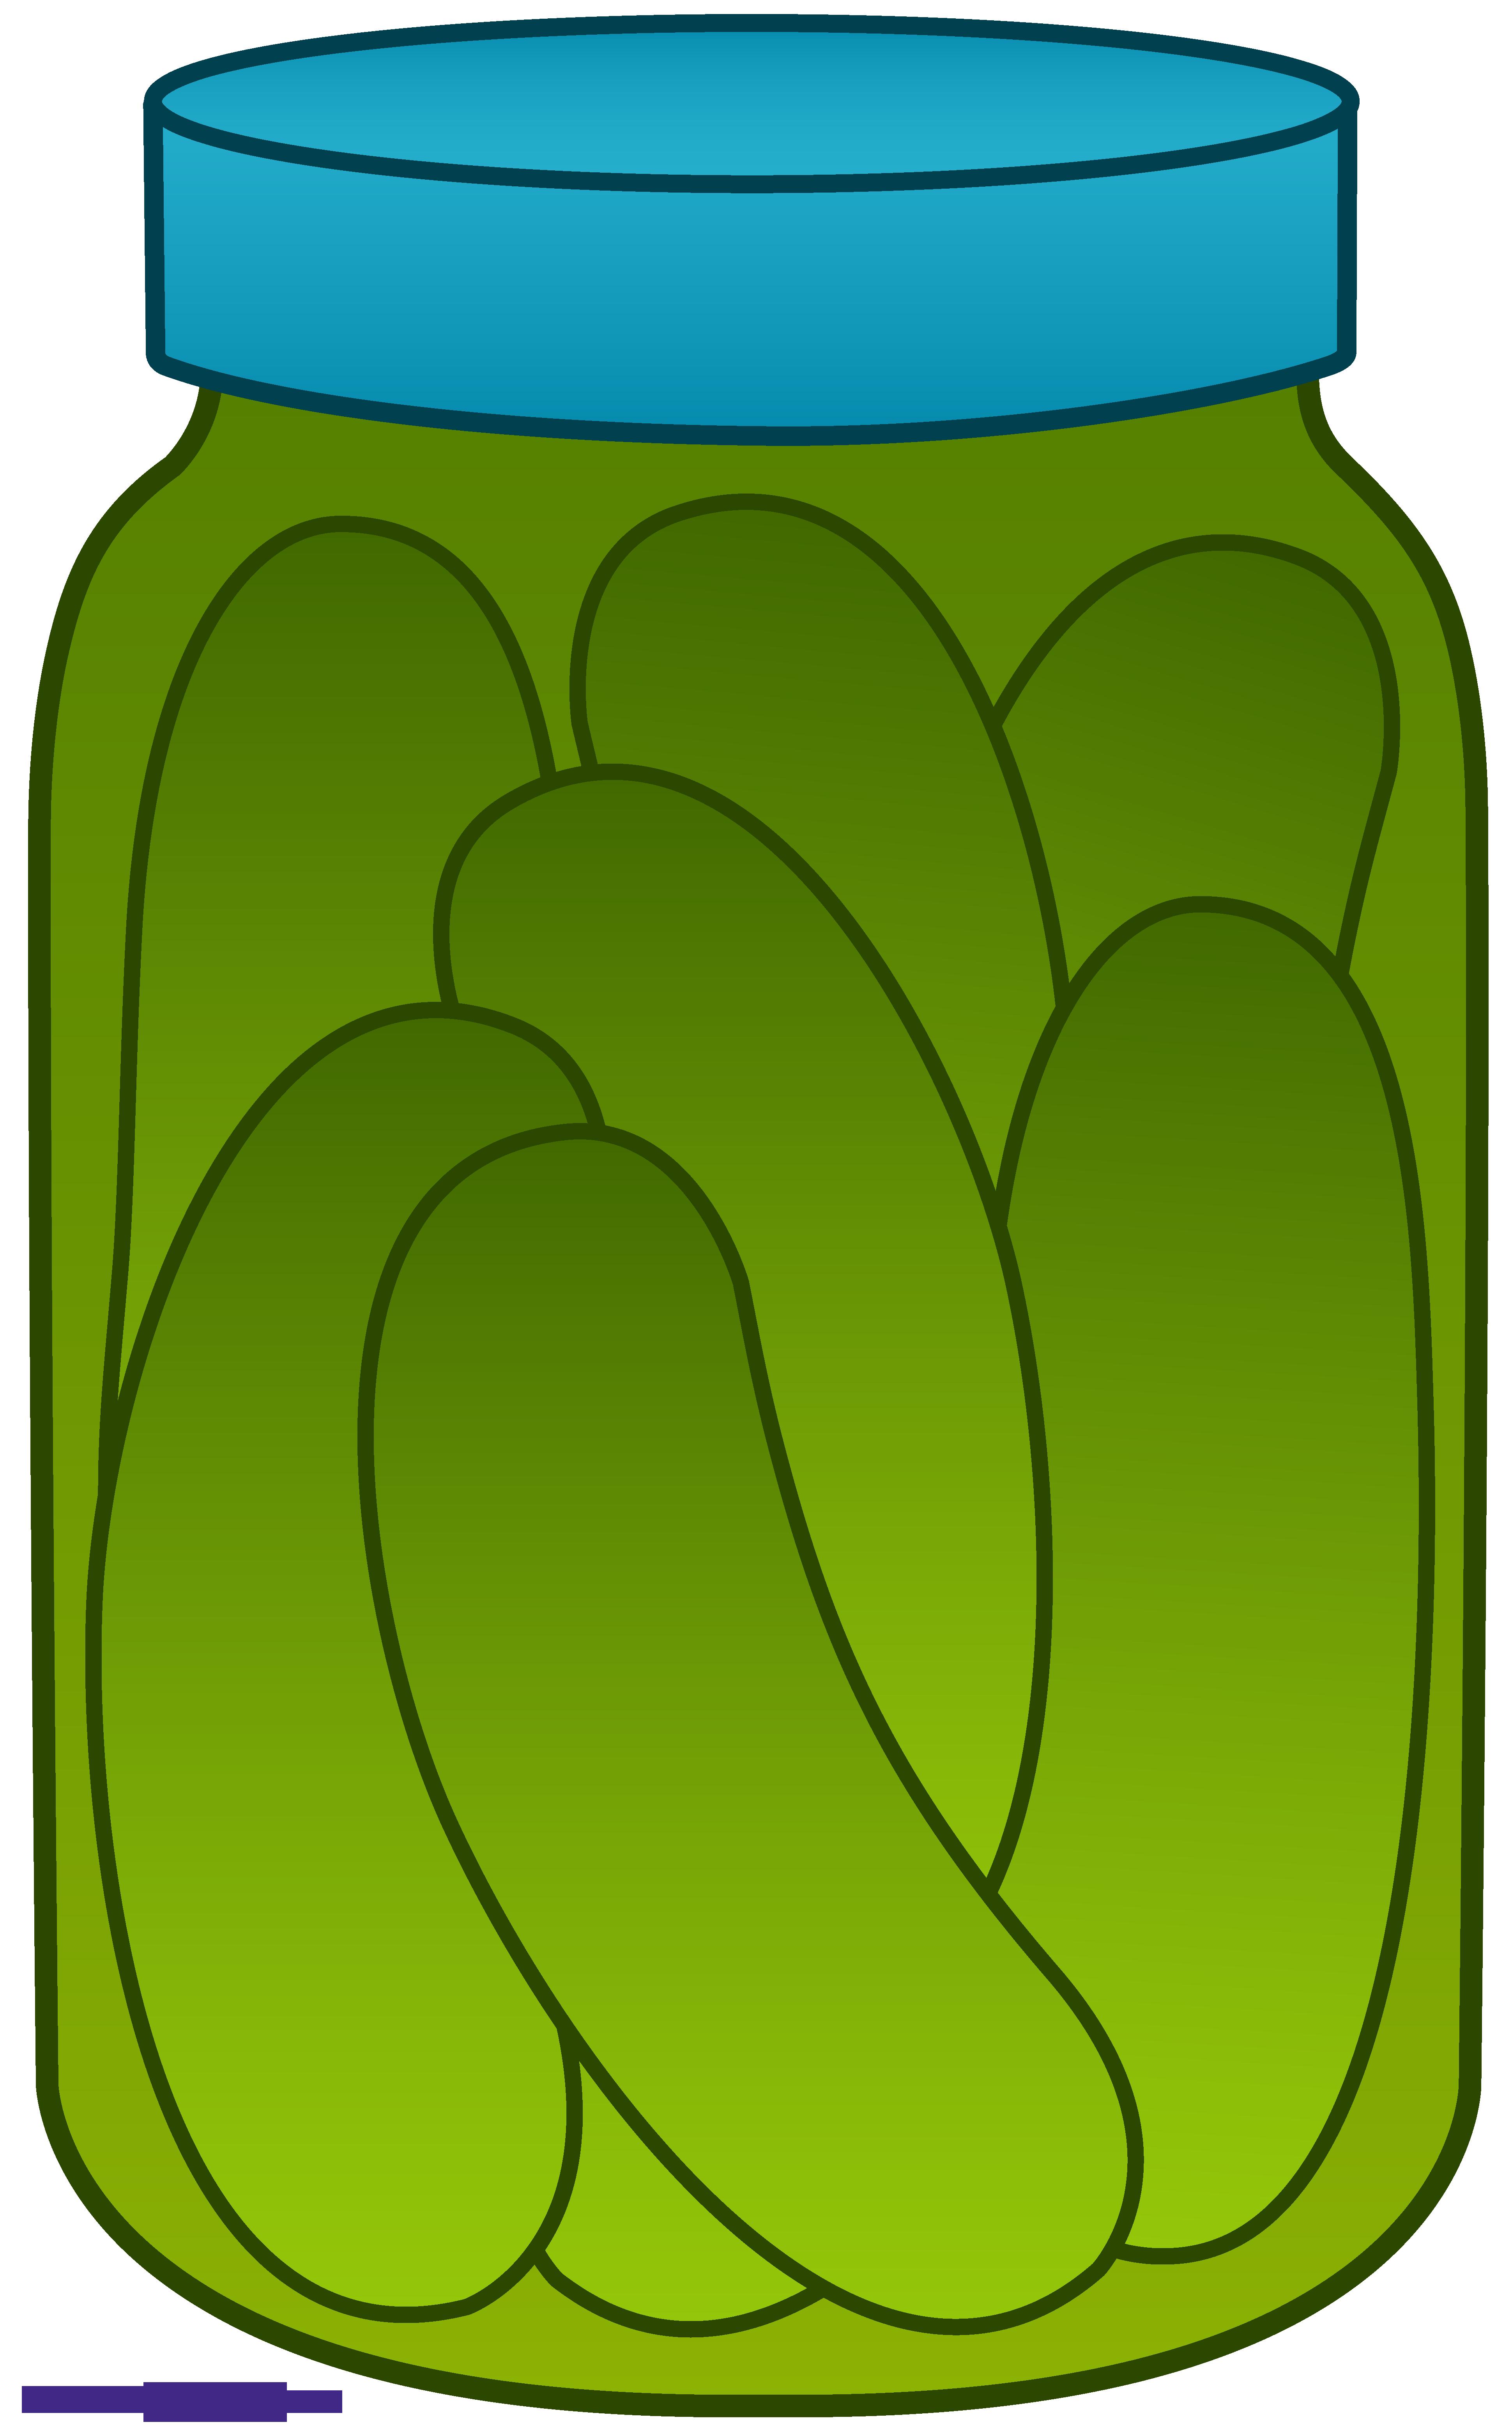 Pickles clipart. Sweet clip art